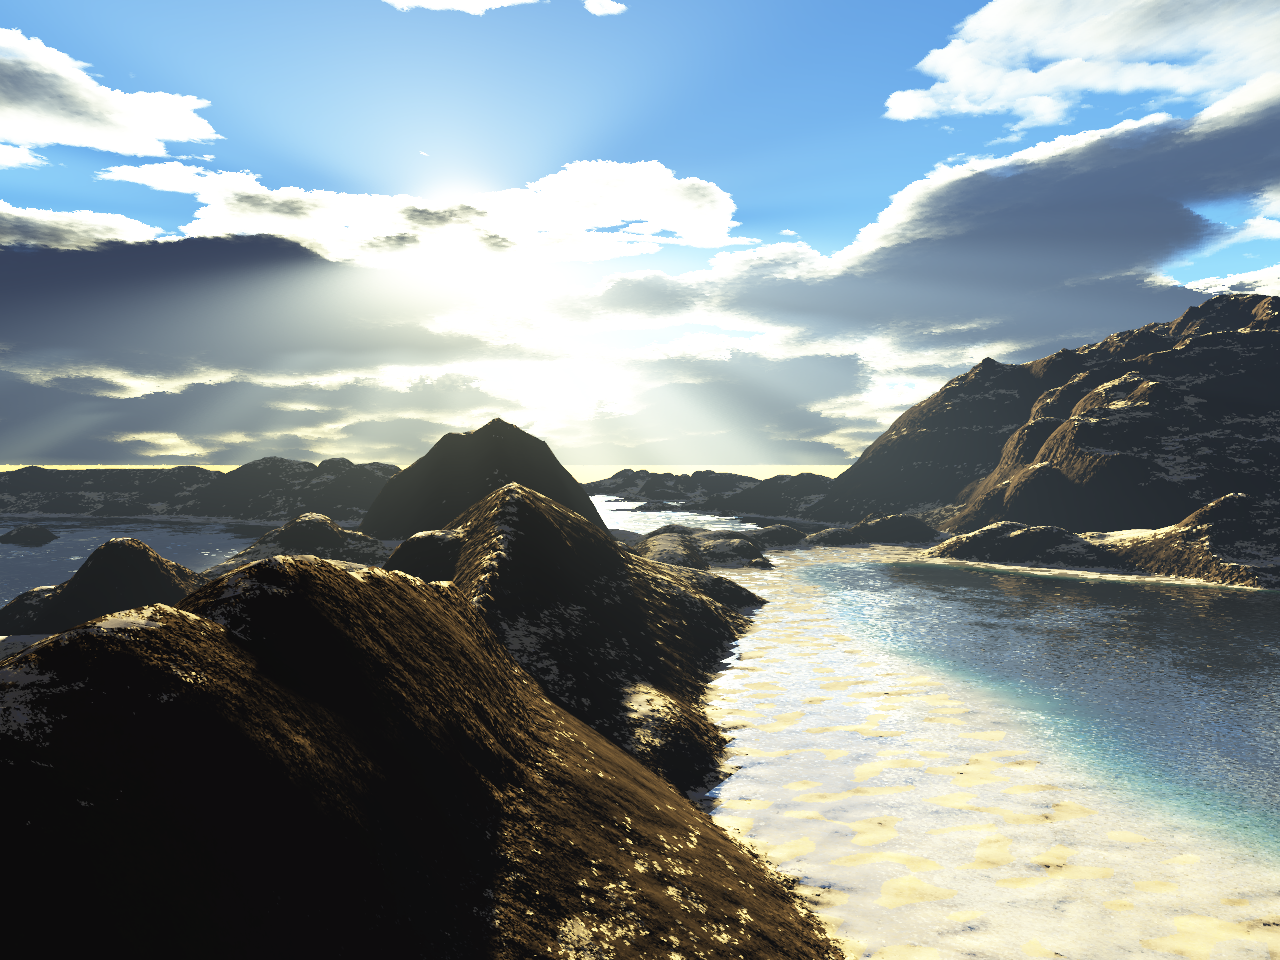 Mountain Beach by TokenArt